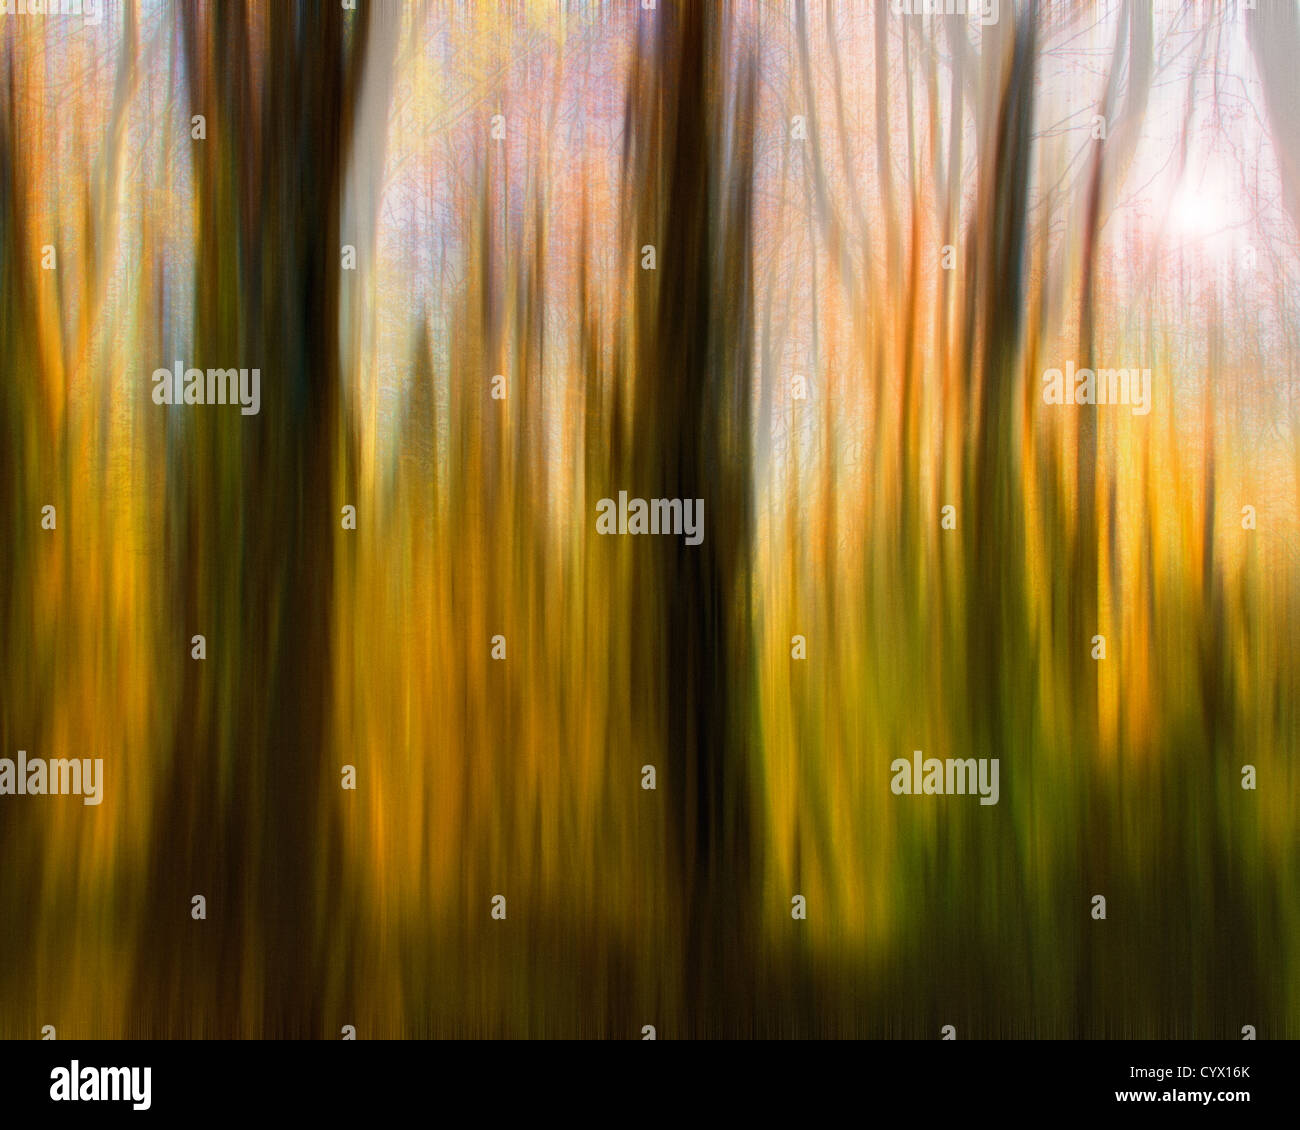 DIGITAL ART: Magic Woods (Calendar Concept) - Stock Image